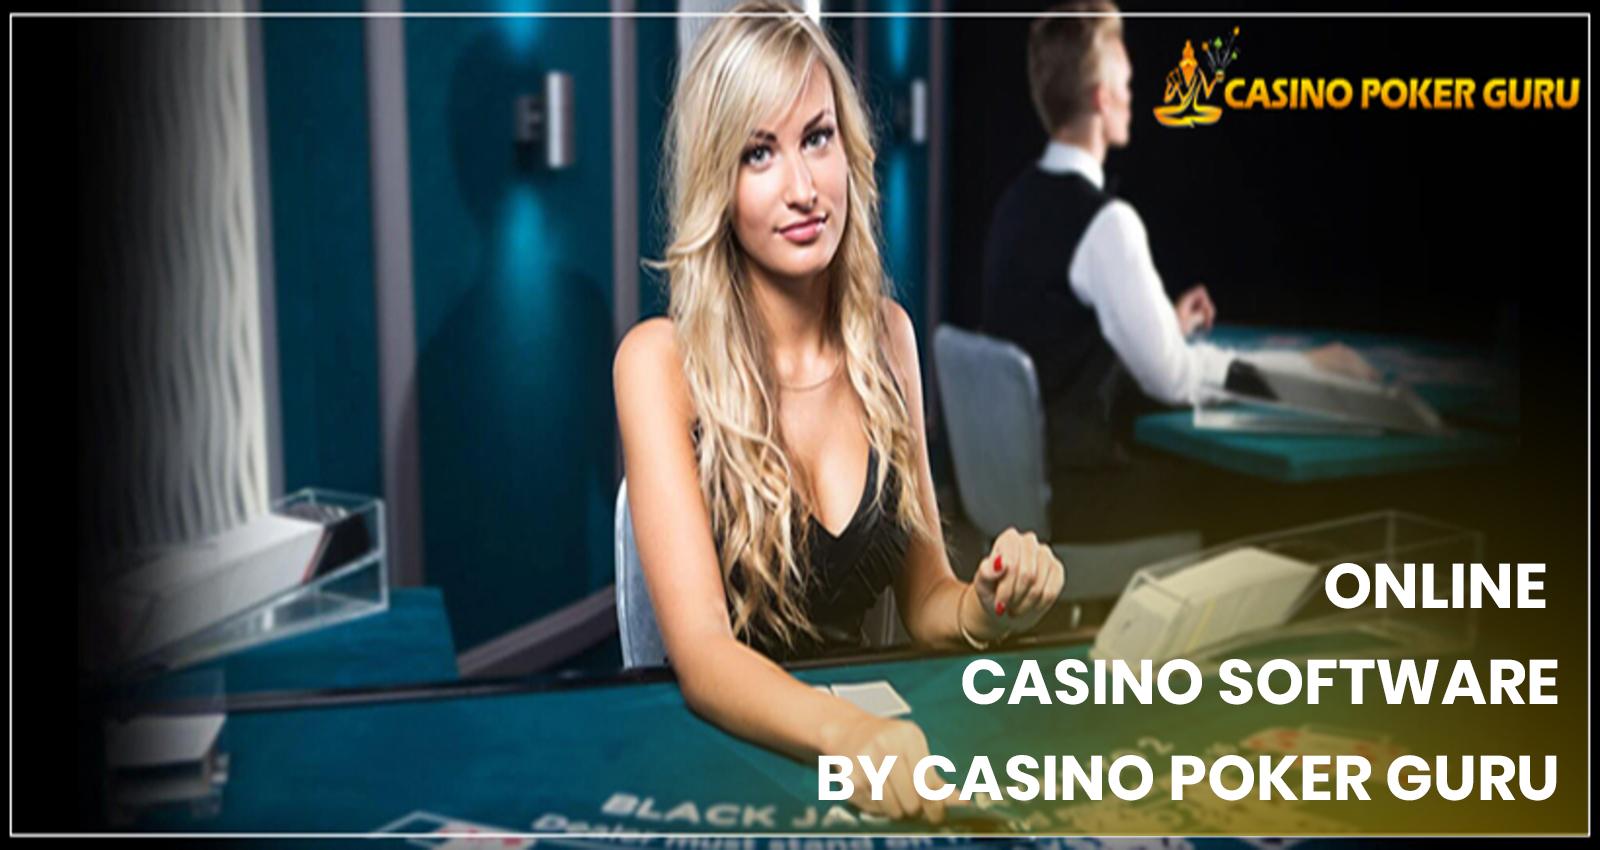 online casino software by casino Poker Guru